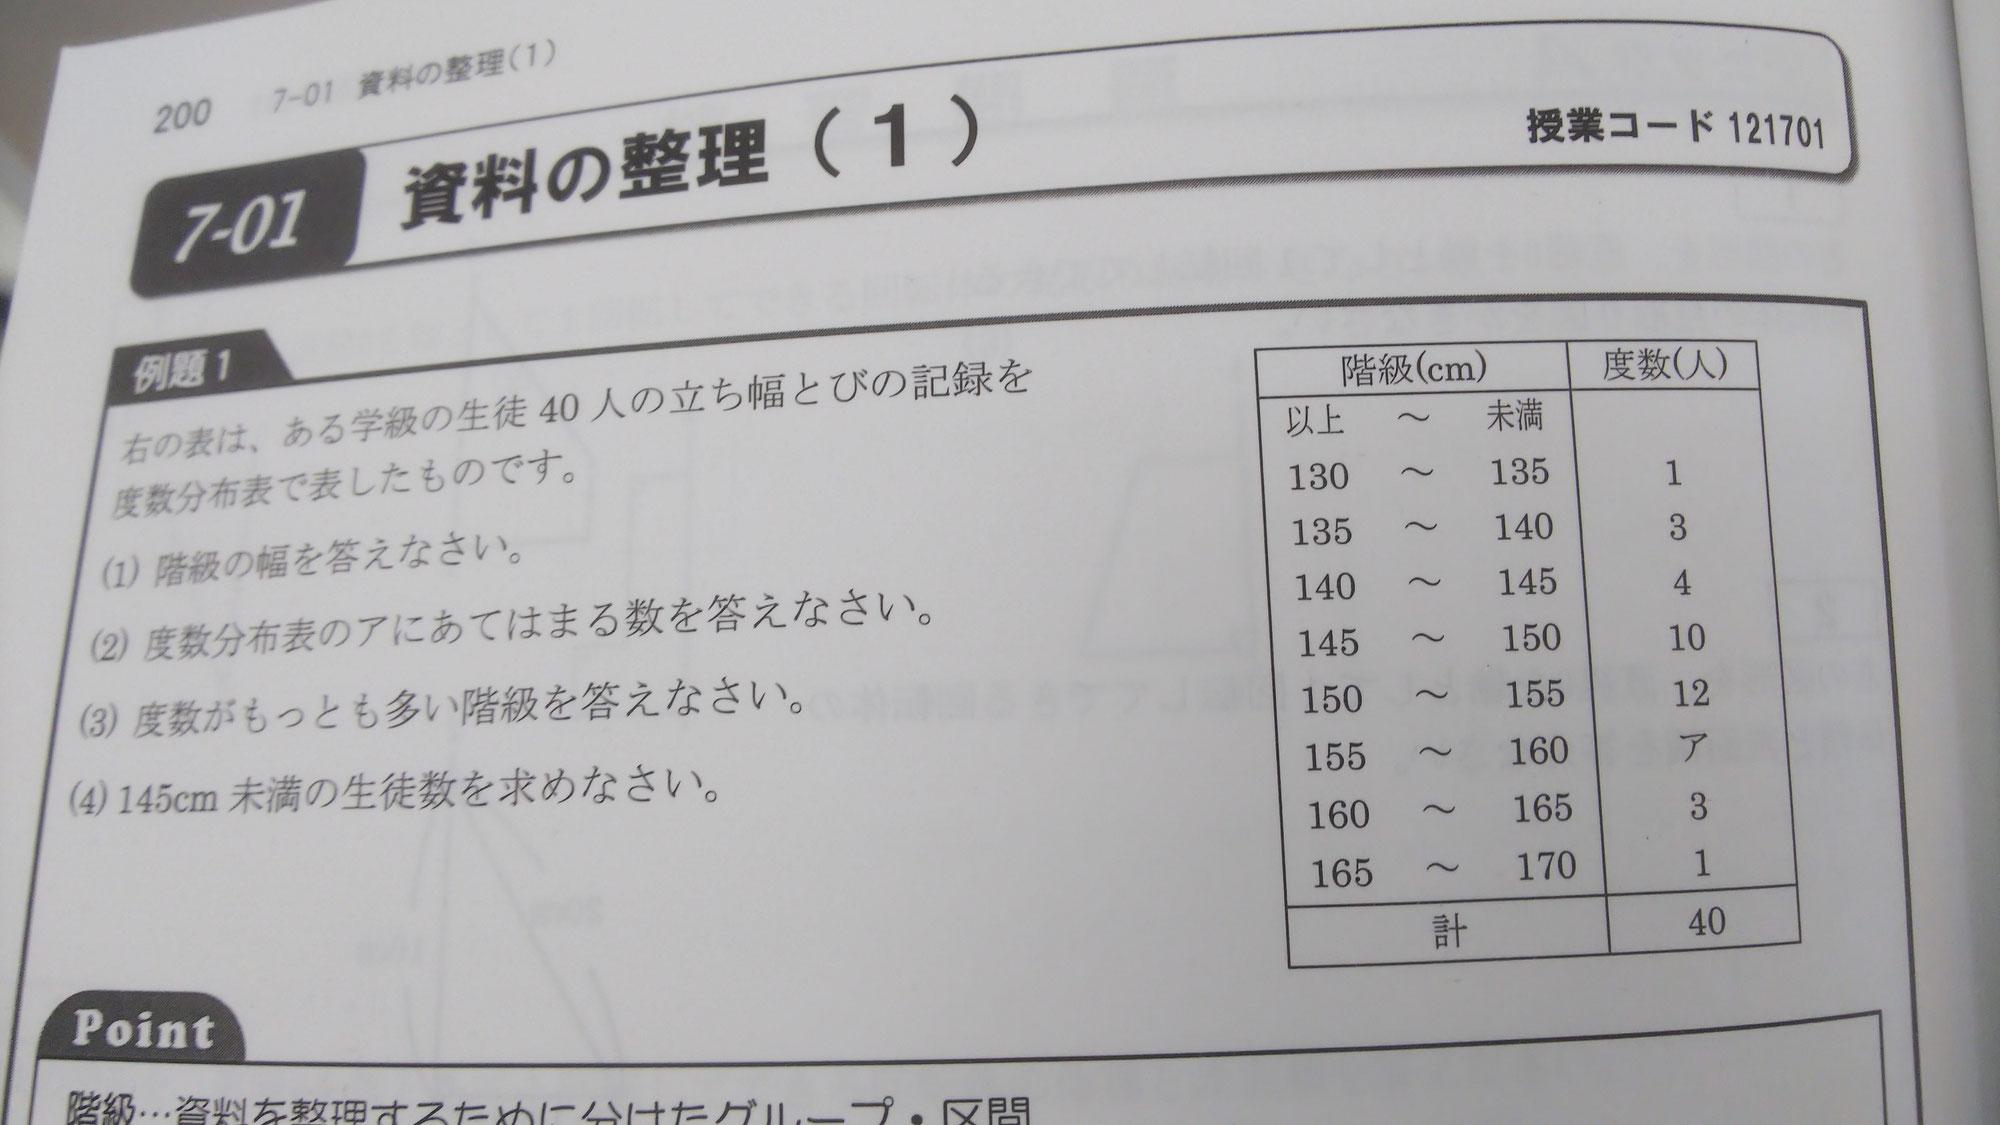 資料の整理例題1